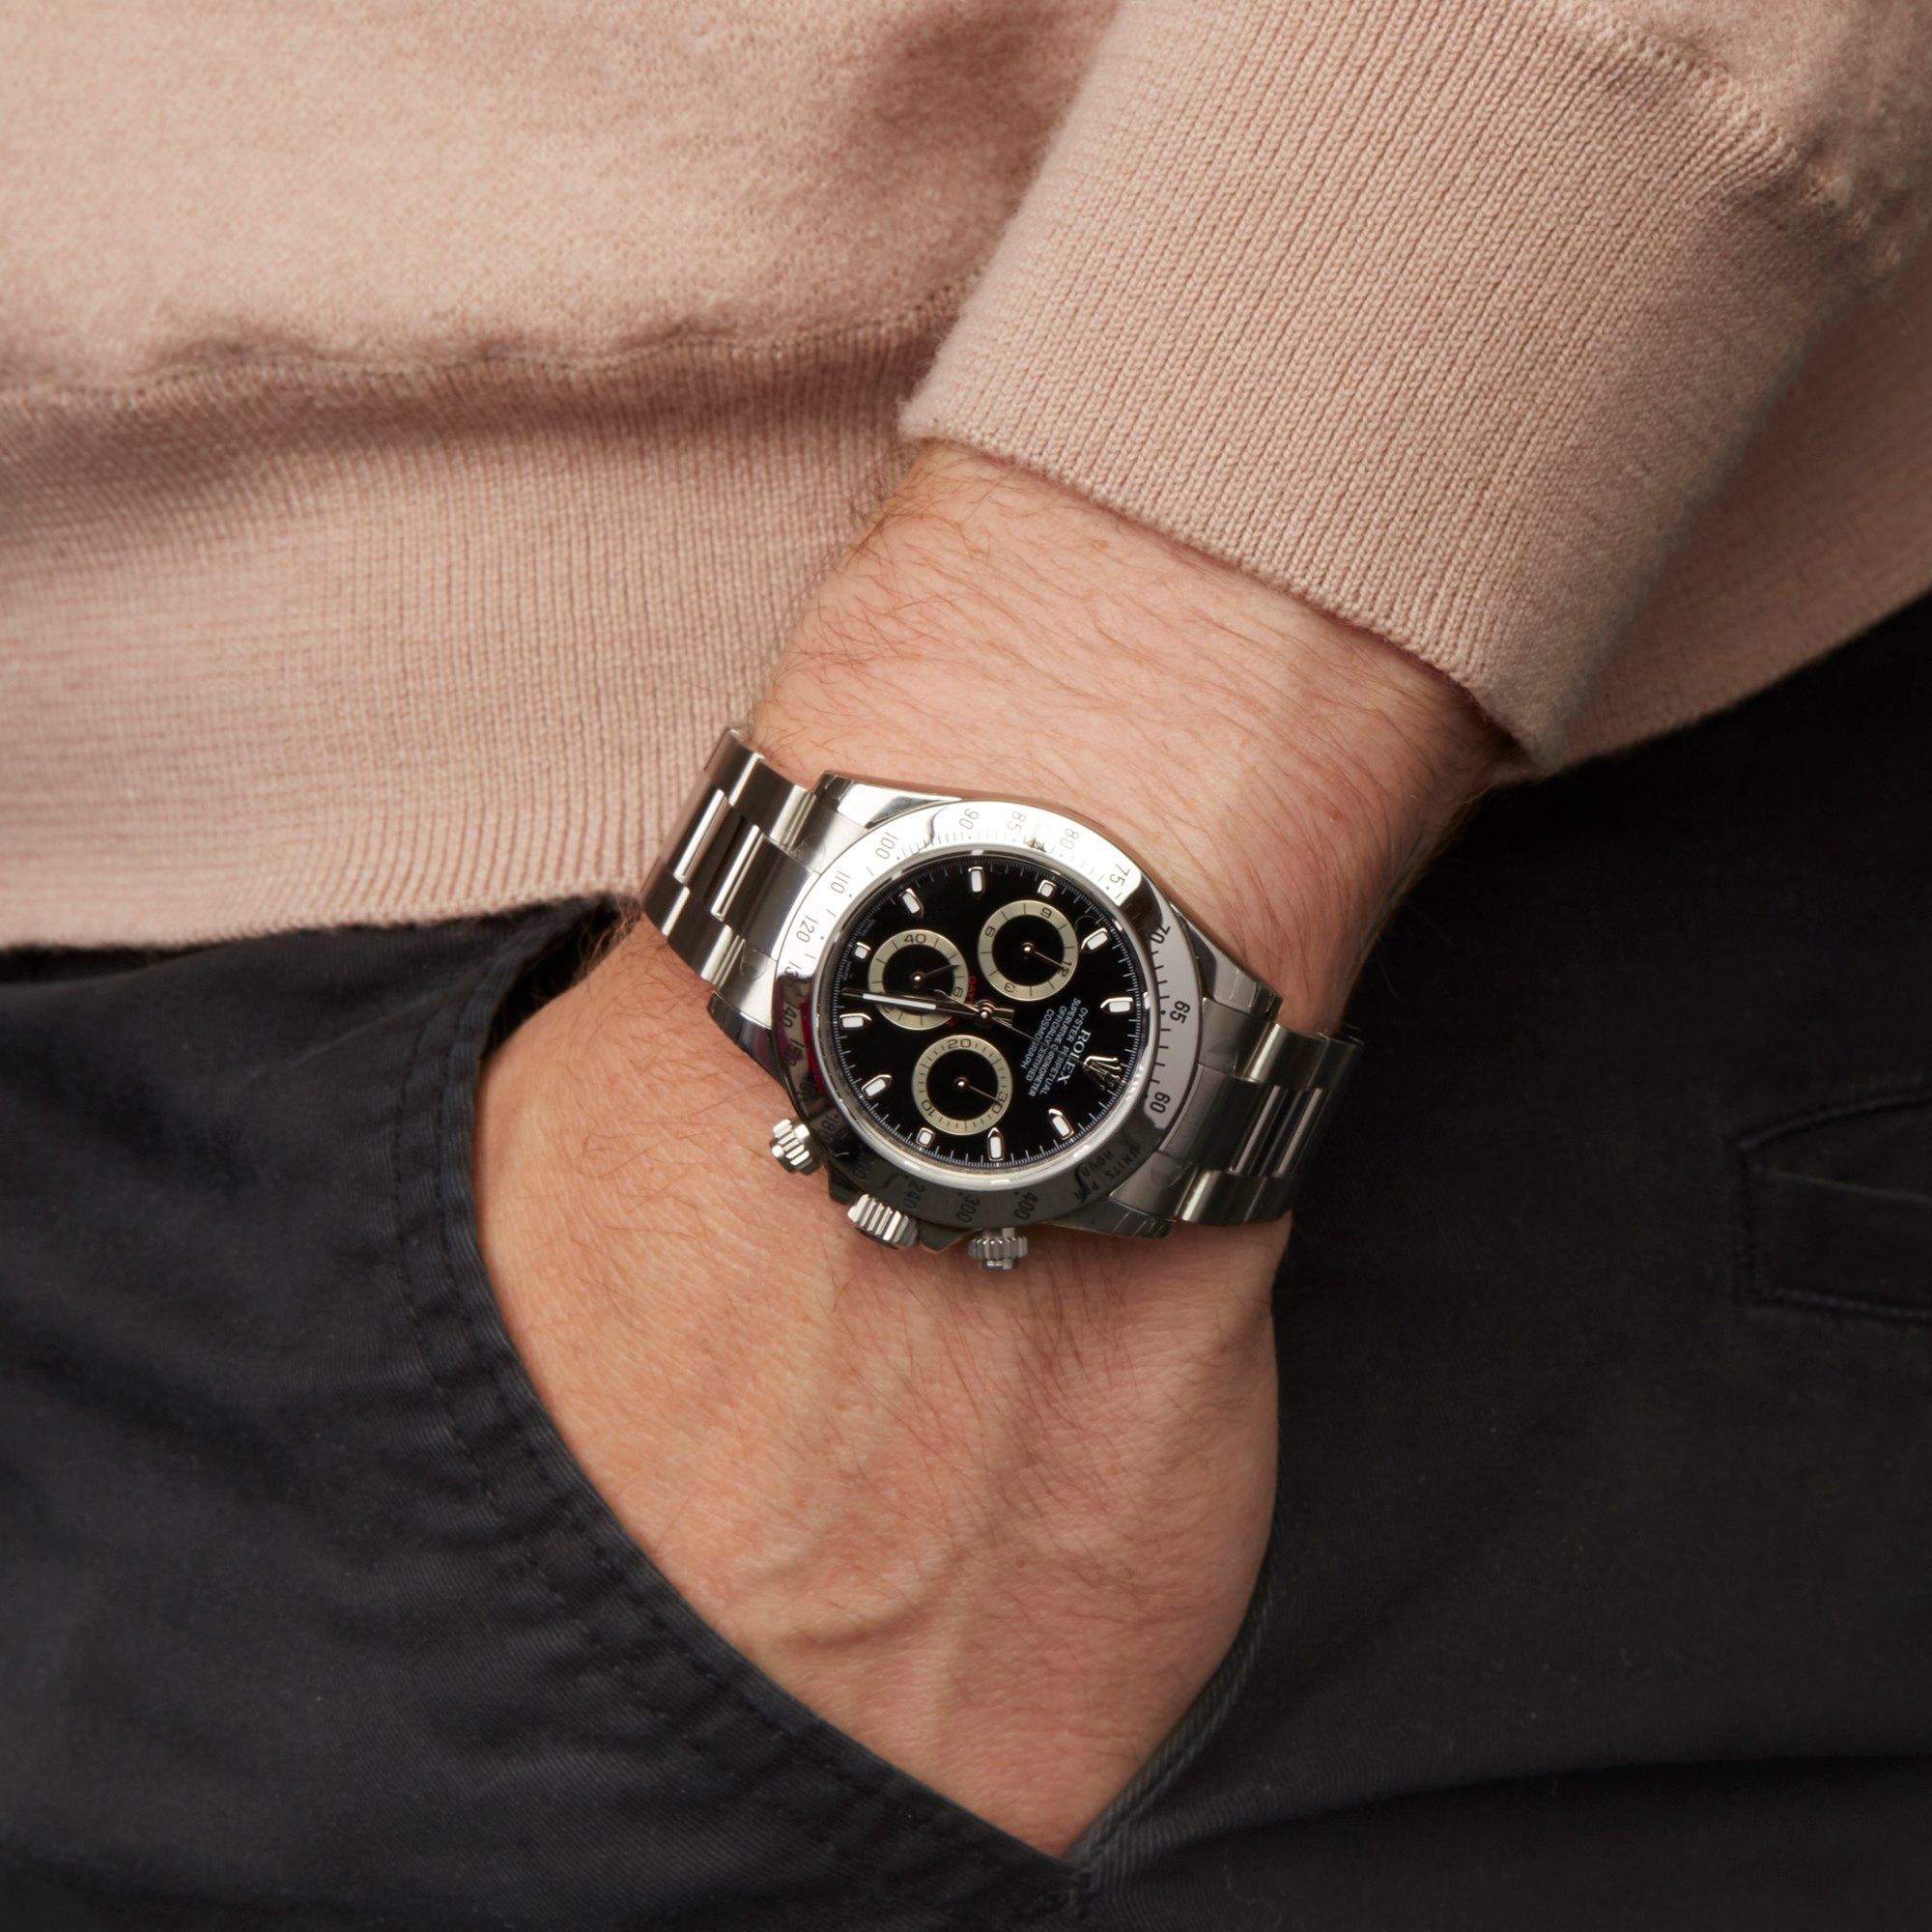 Rolex Daytona Chronograph NOS Roestvrij Staal 116520